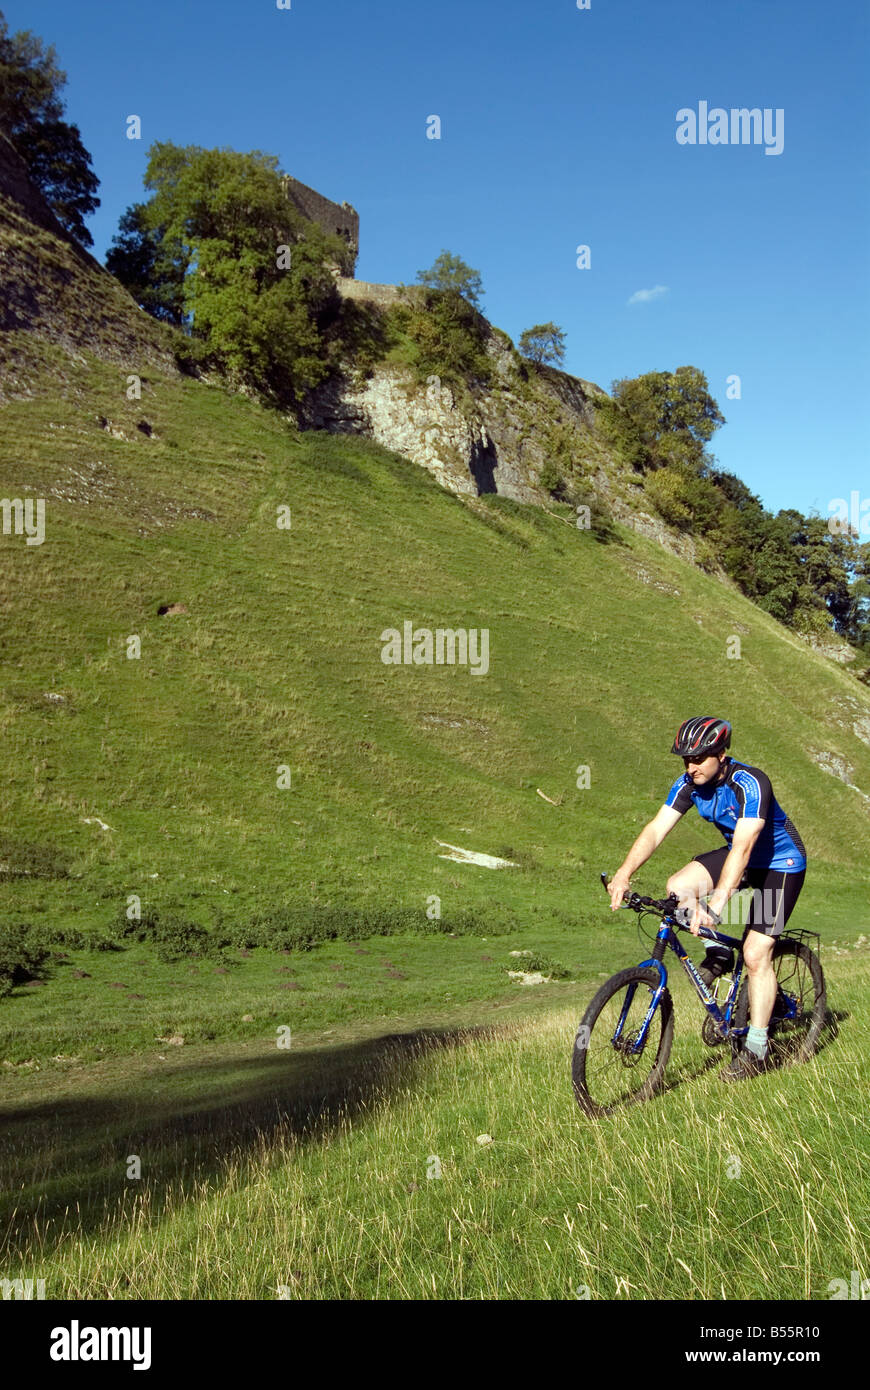 Doug Blane mountain bike Cavedale Castleton en el Peak District National Park Derbyshire, Reino Unido Inglaterra GB Gran Bretaña Foto de stock